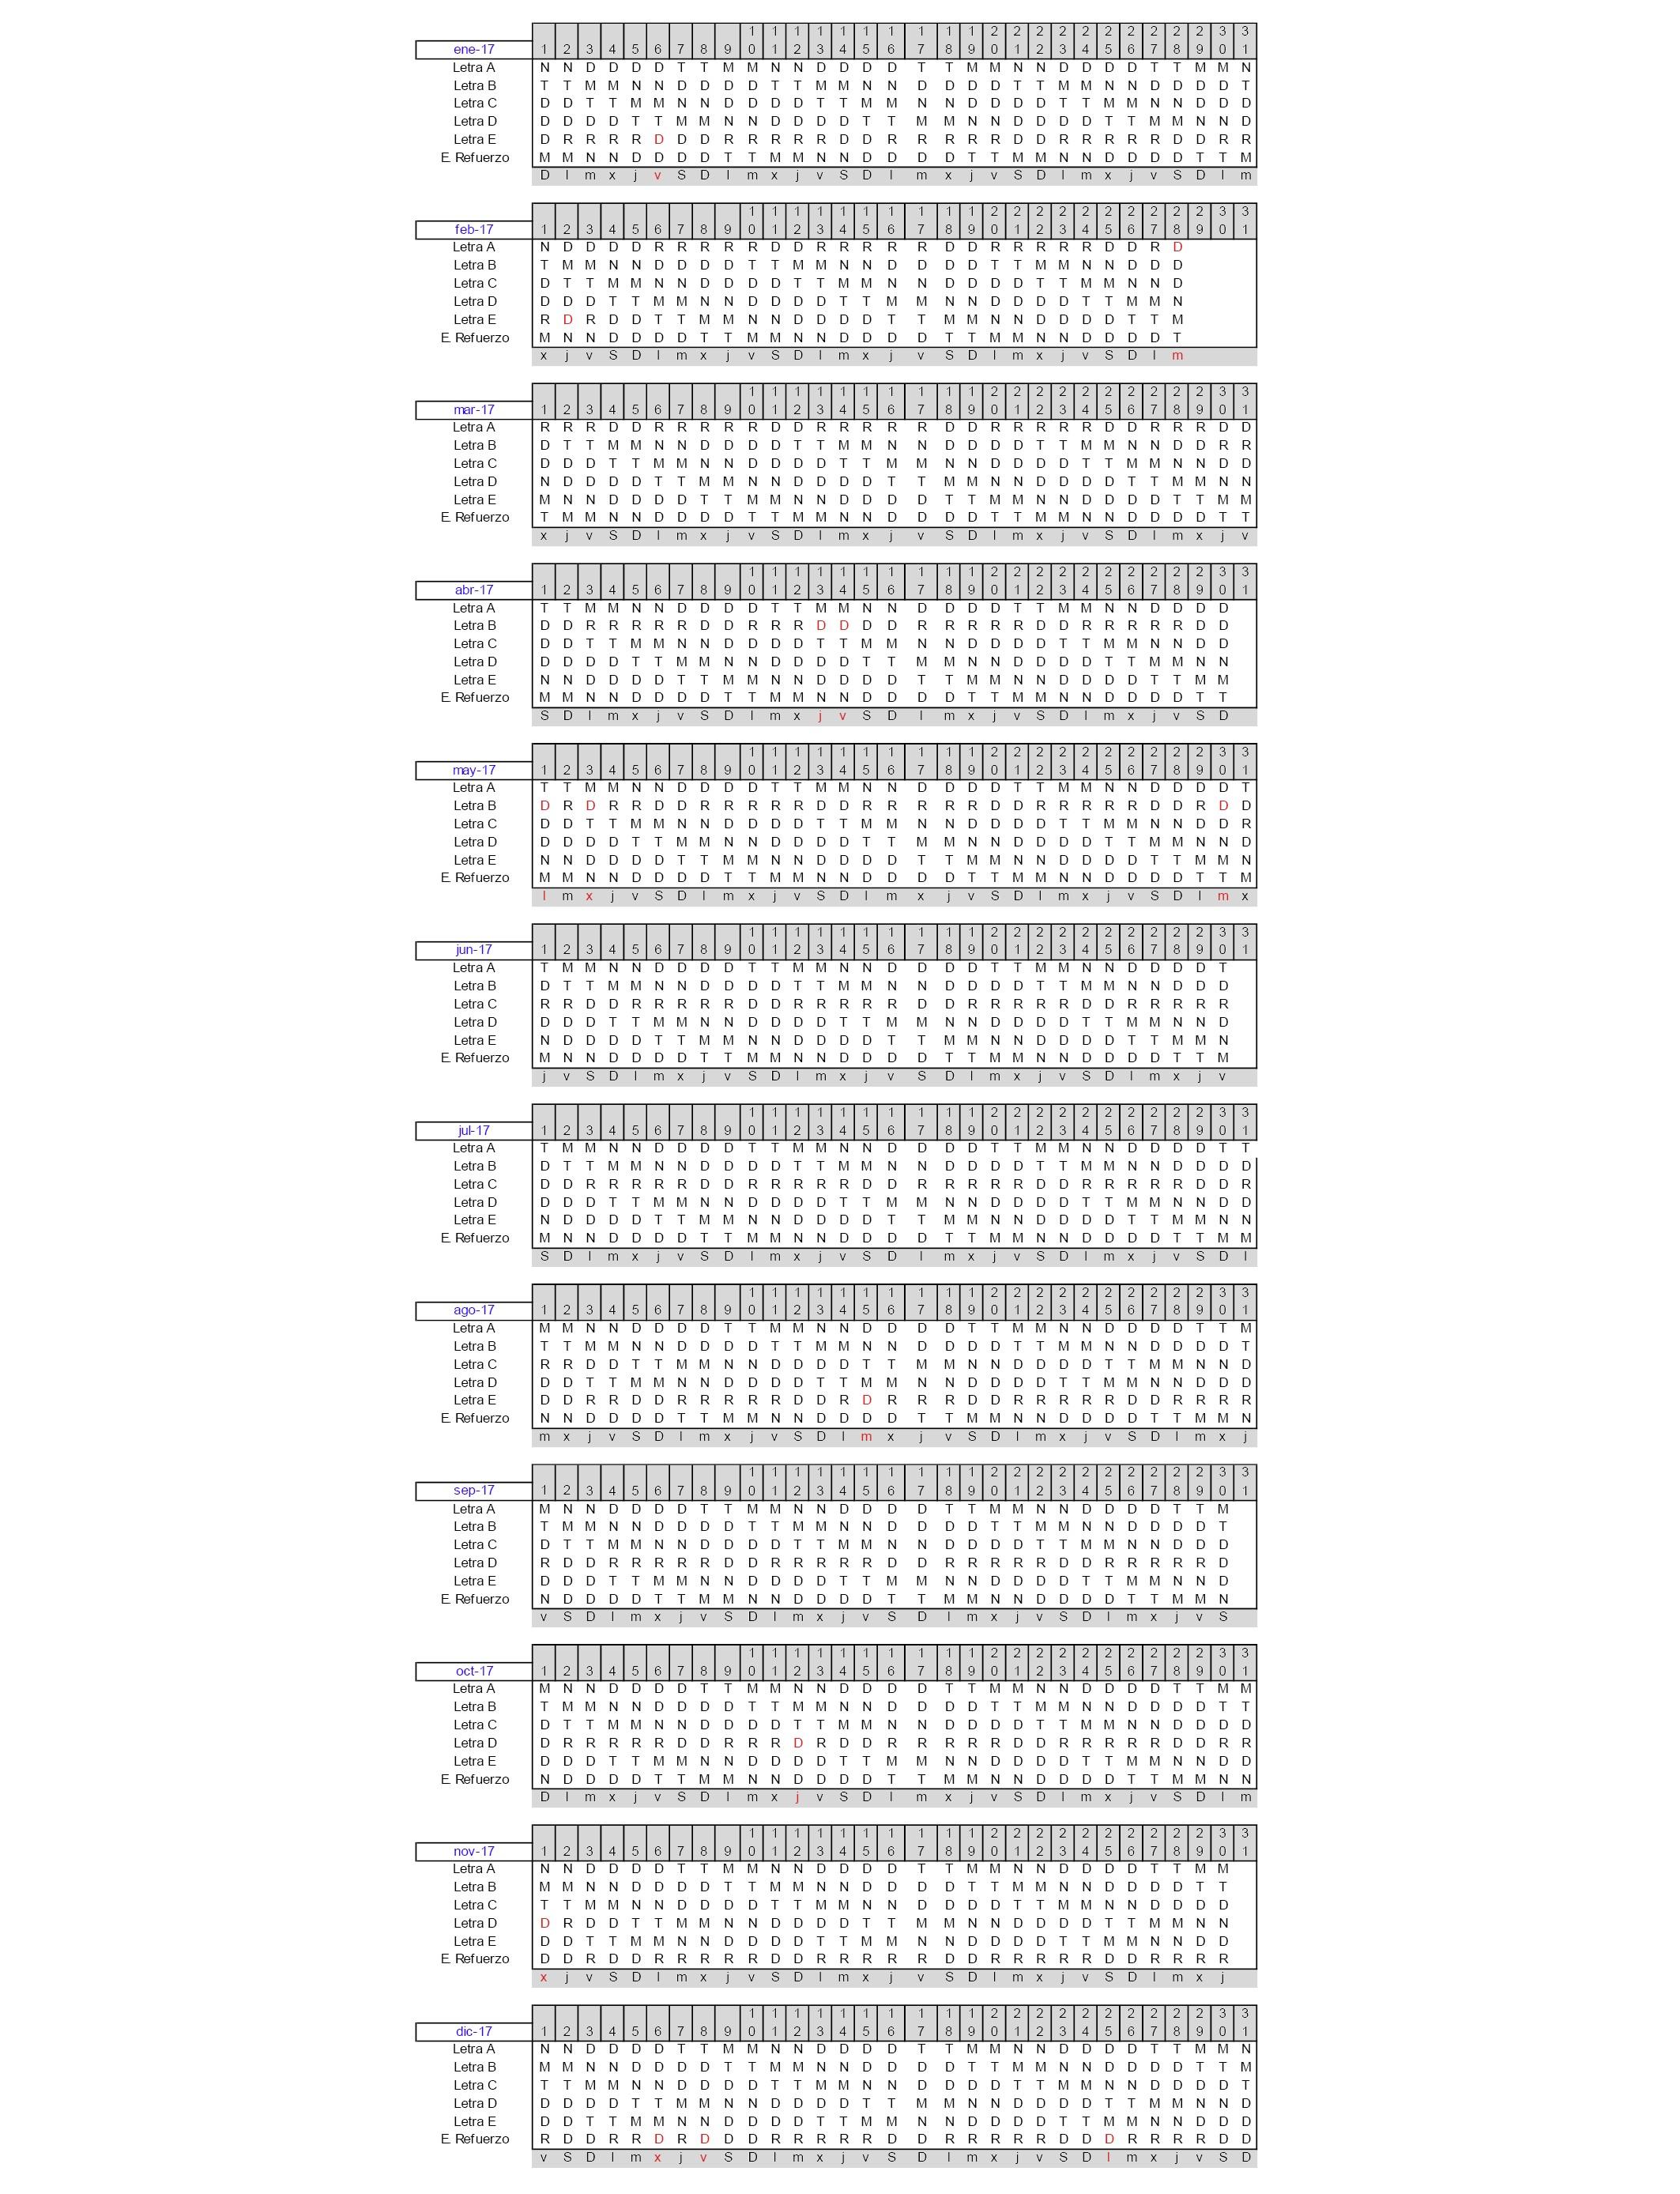 Calendario Laboral 2019 Boe Recientes Boe Documento Boe A 2016 5551 Of Calendario Laboral 2019 Boe Recientes Boe Documento Boe A 2016 5551